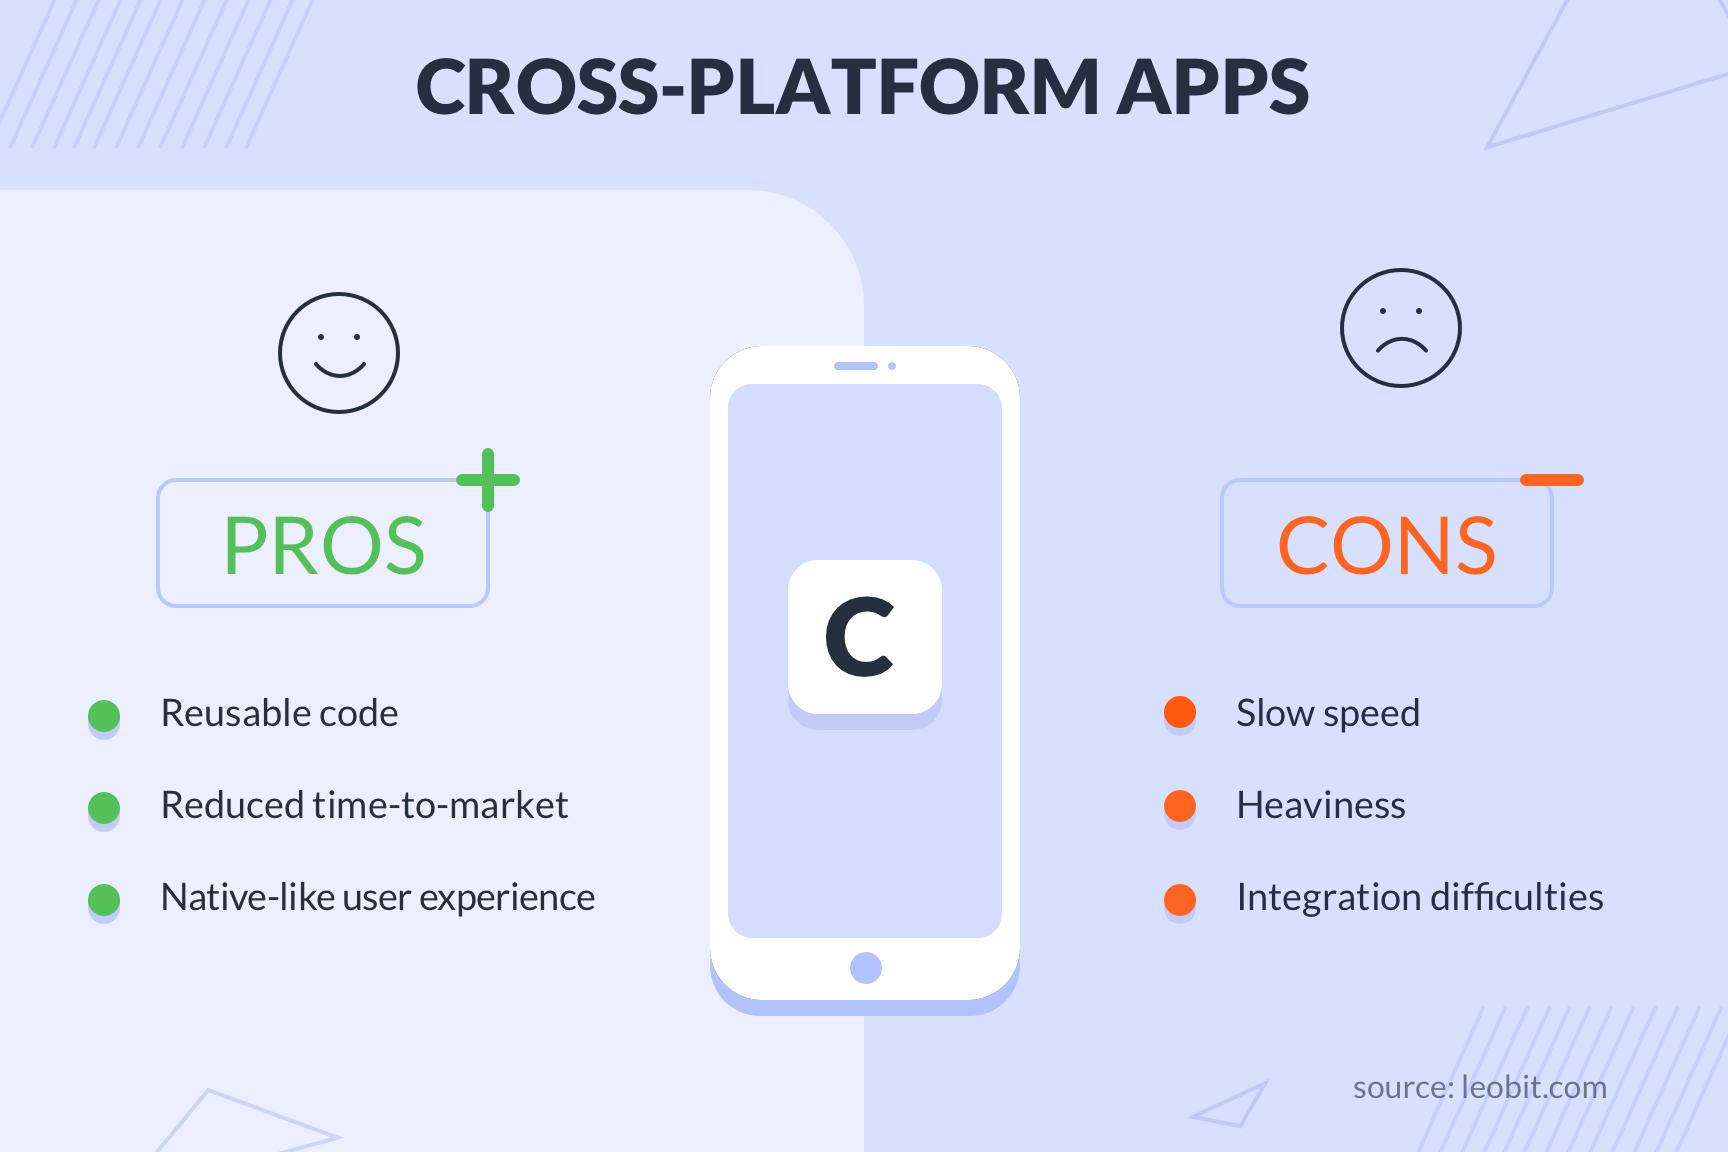 Advantages and disadvantages of cross-platform app development